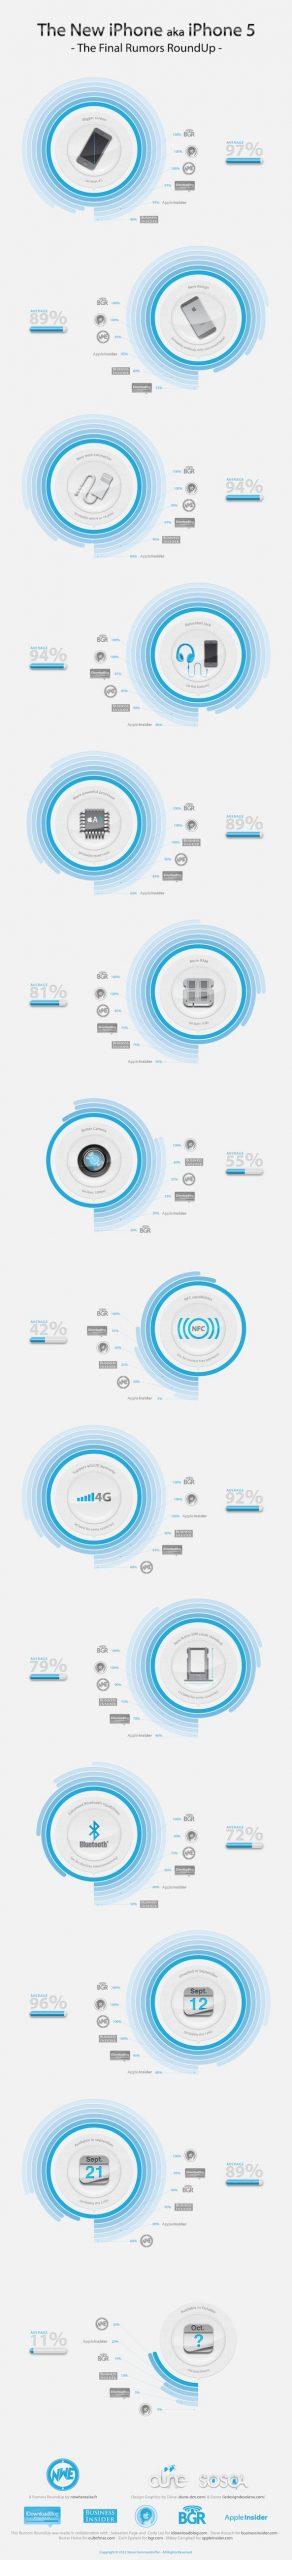 iPhone 5 Rumor Roundup Infographic